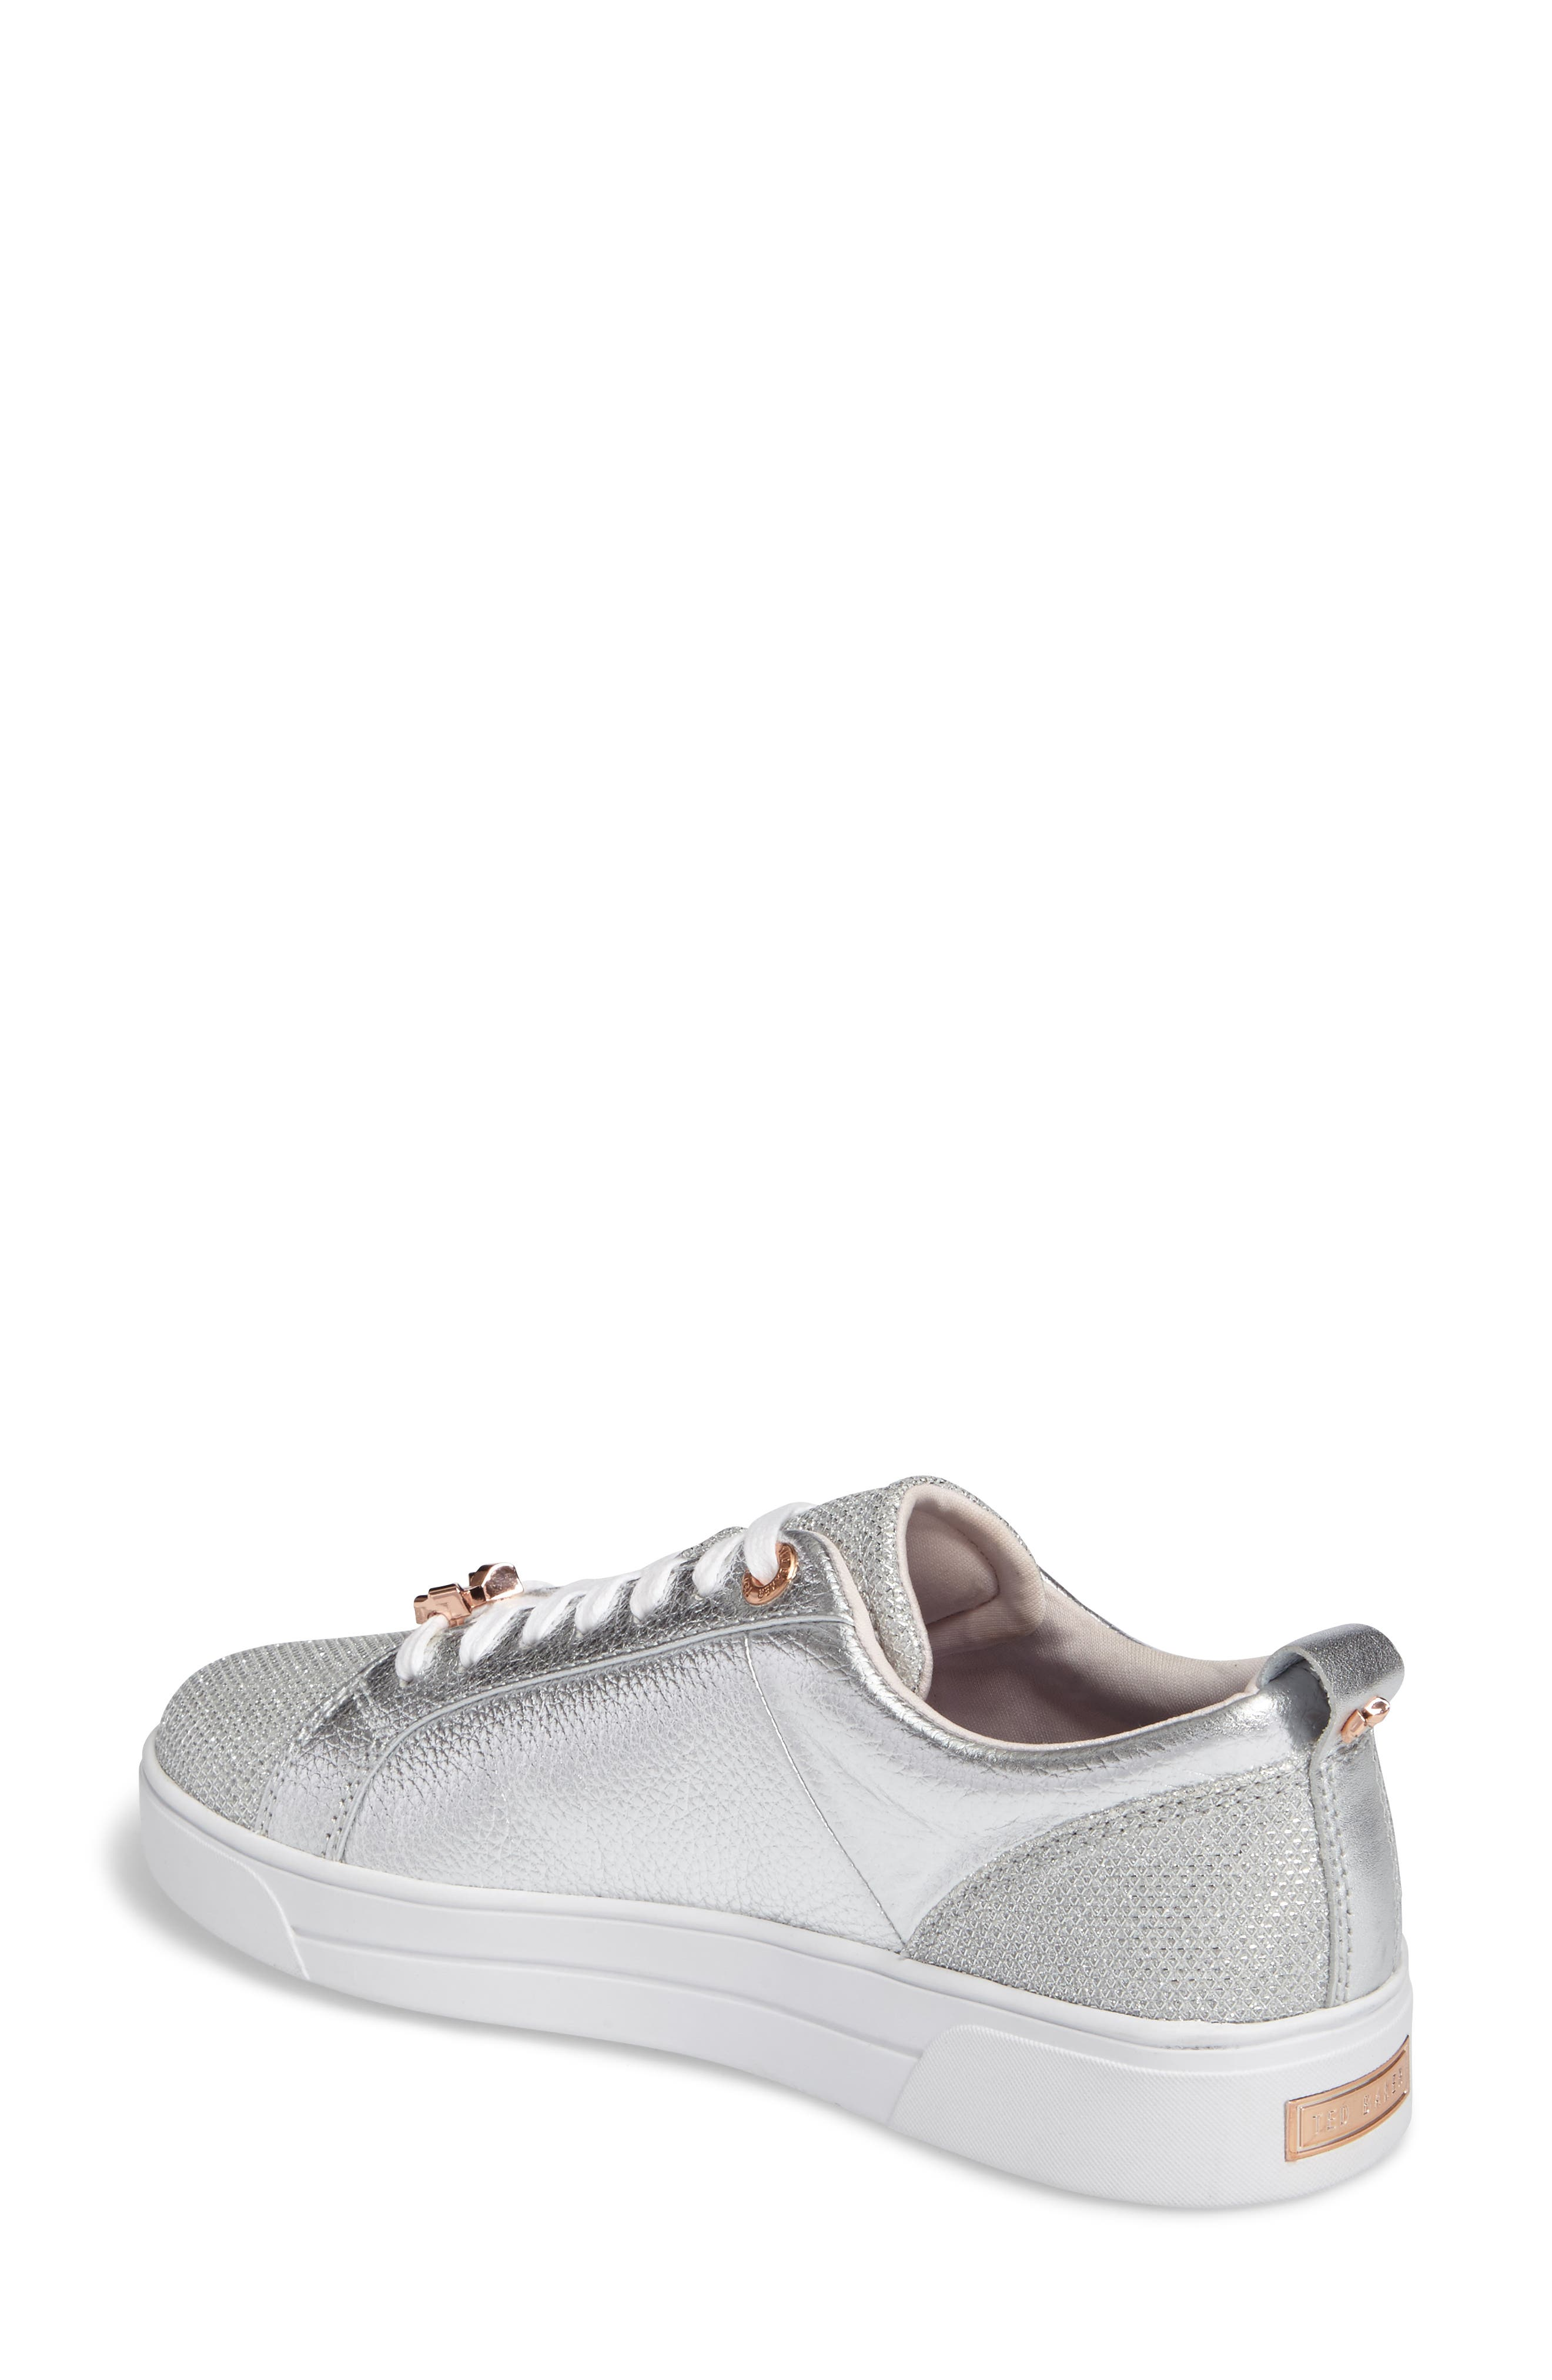 Kulei Sneaker,                             Alternate thumbnail 3, color,                             Silver Leather